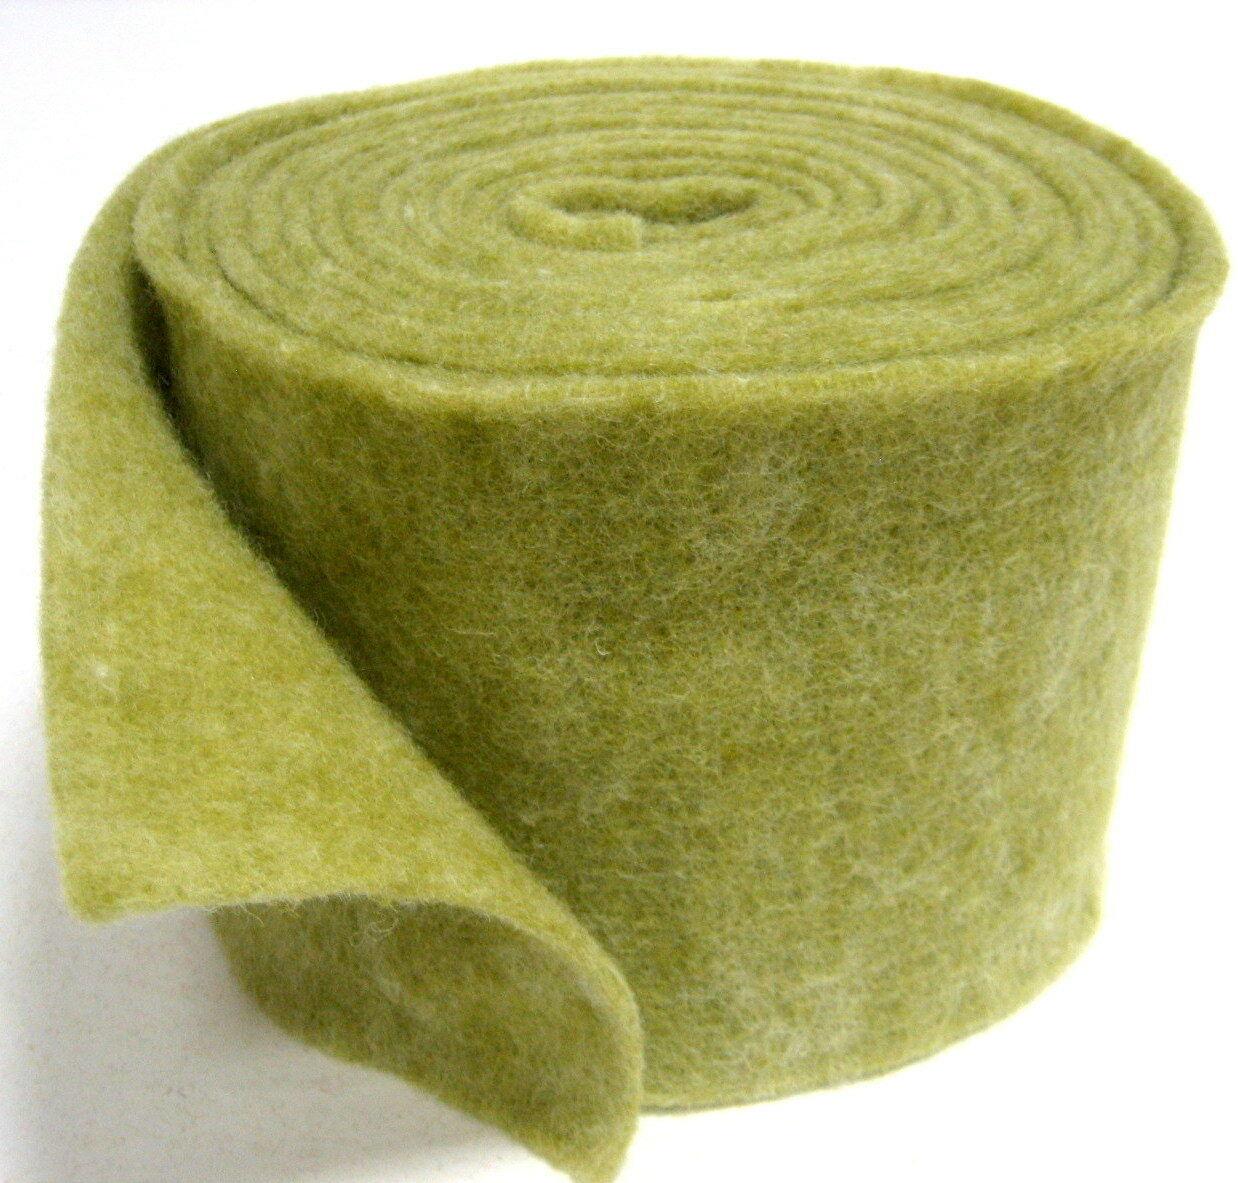 Topfband Filz 5 m x 15 cm Dekoband Wollvlies Filzband Wollband Schafwolle Bastel - Olive